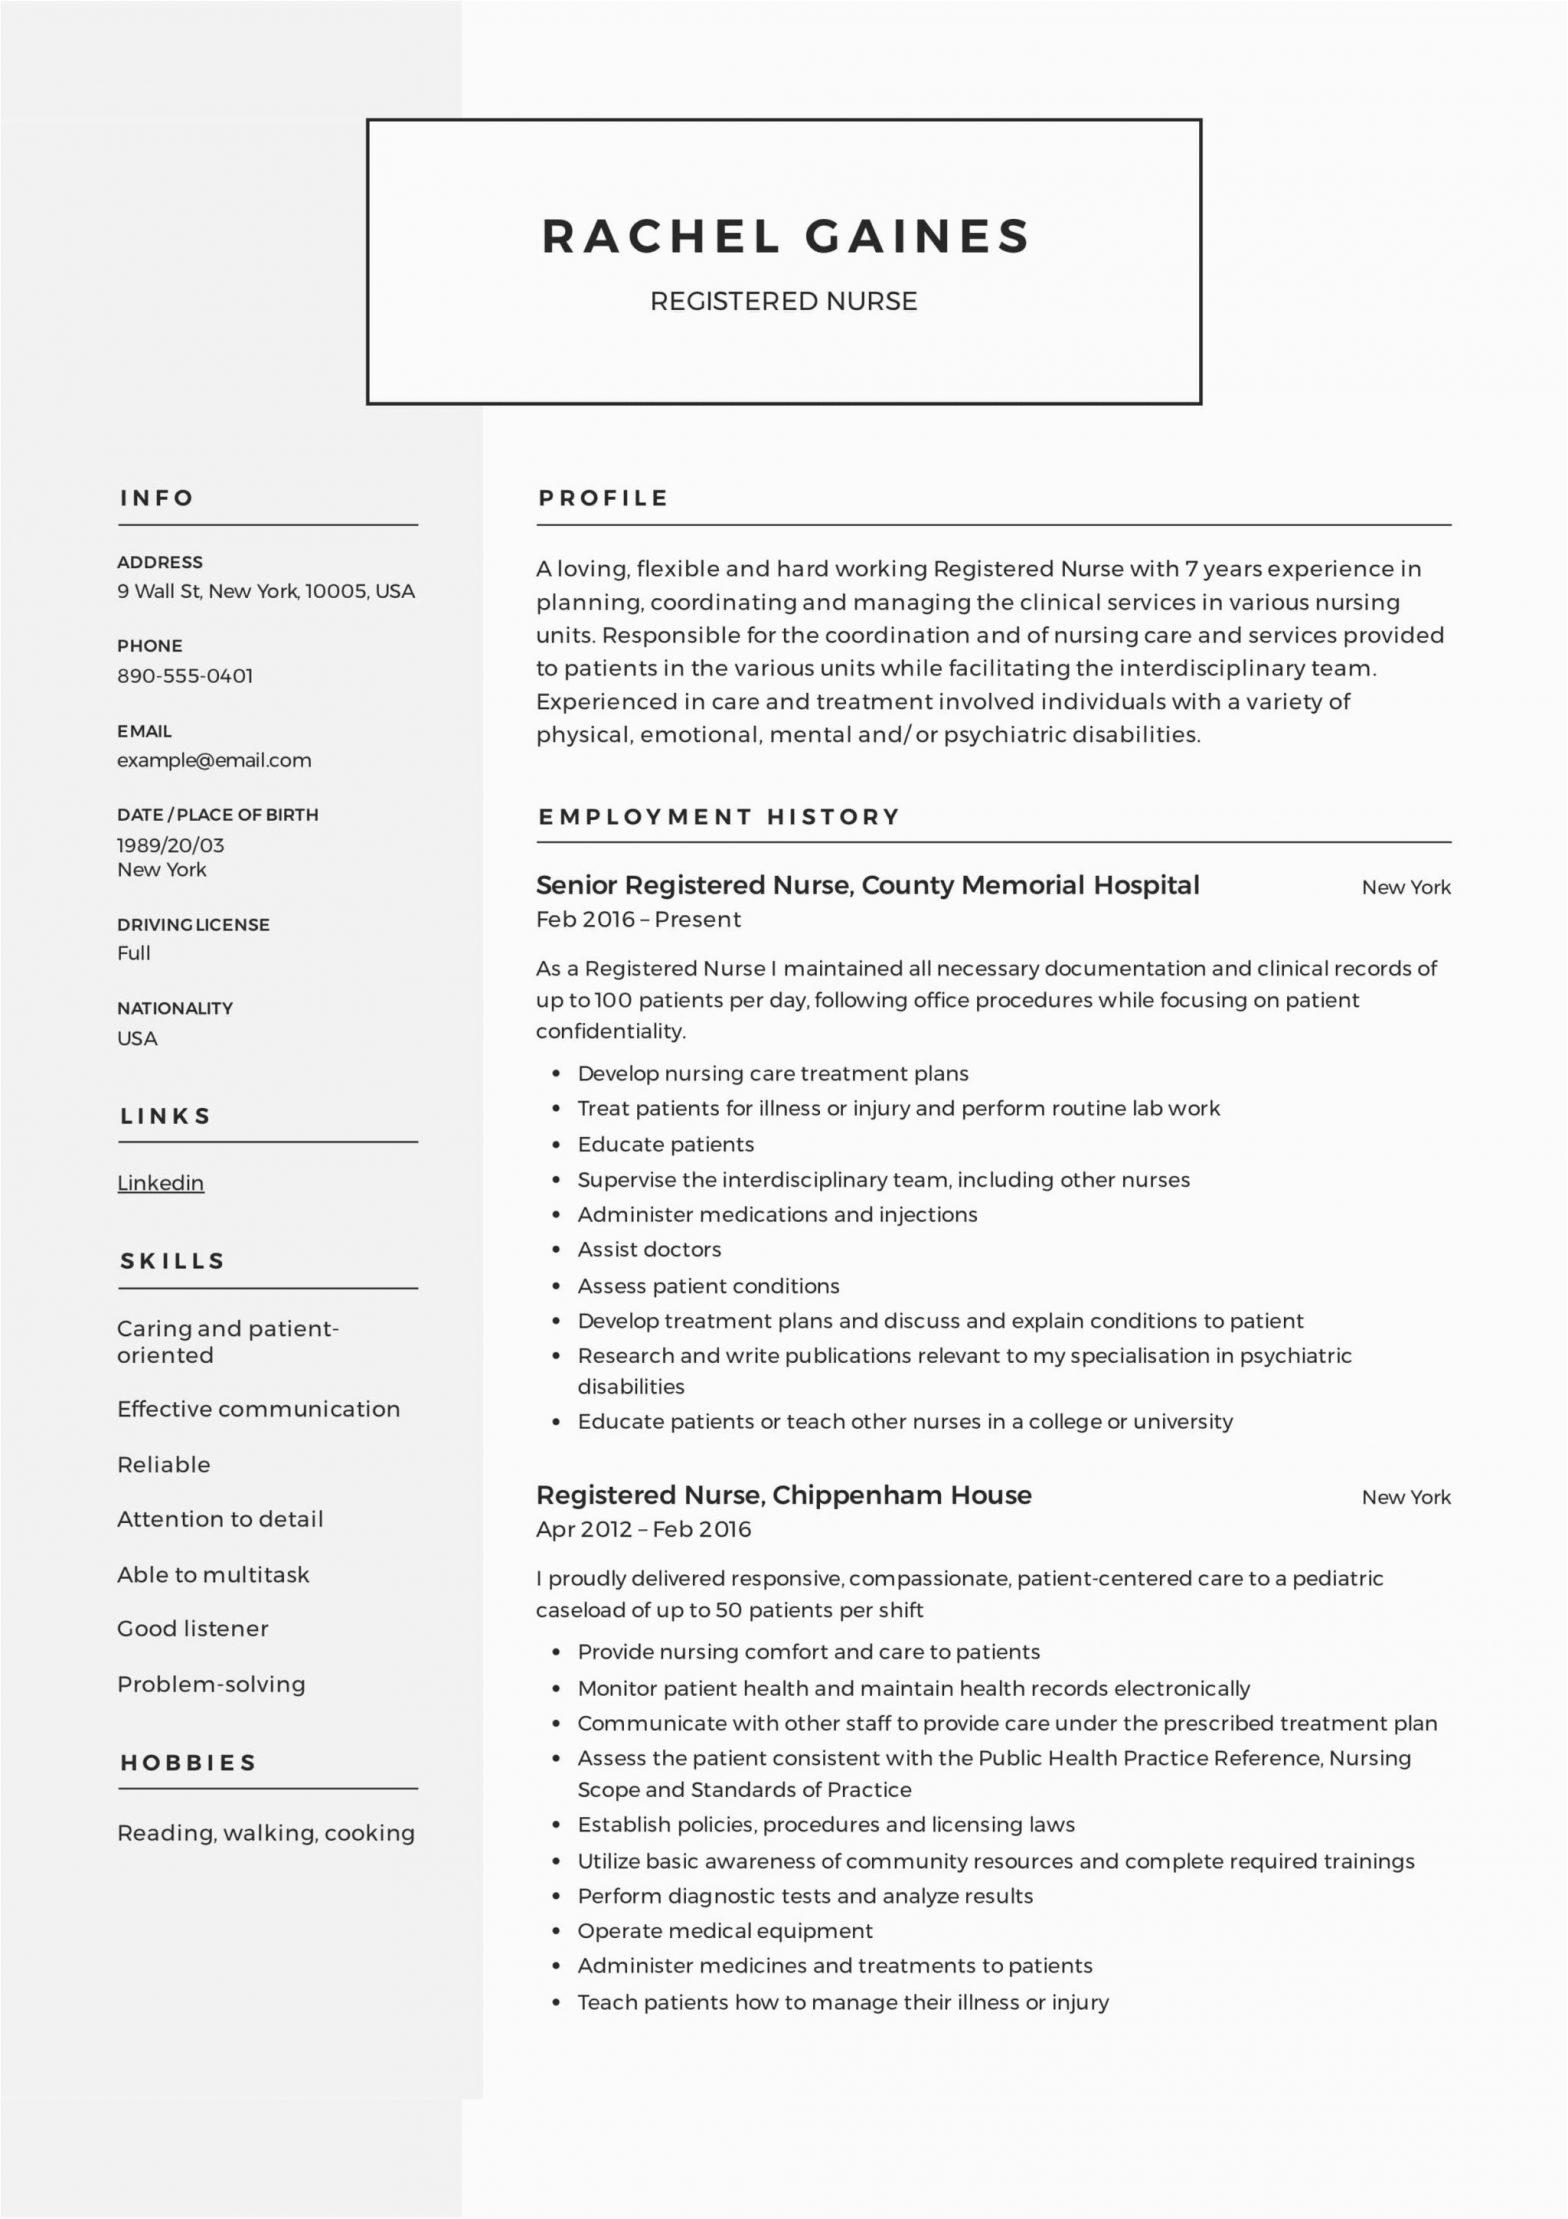 Free Sample Resume for Registered Nurse Registered Nurse Resume Sample & Writing Guide